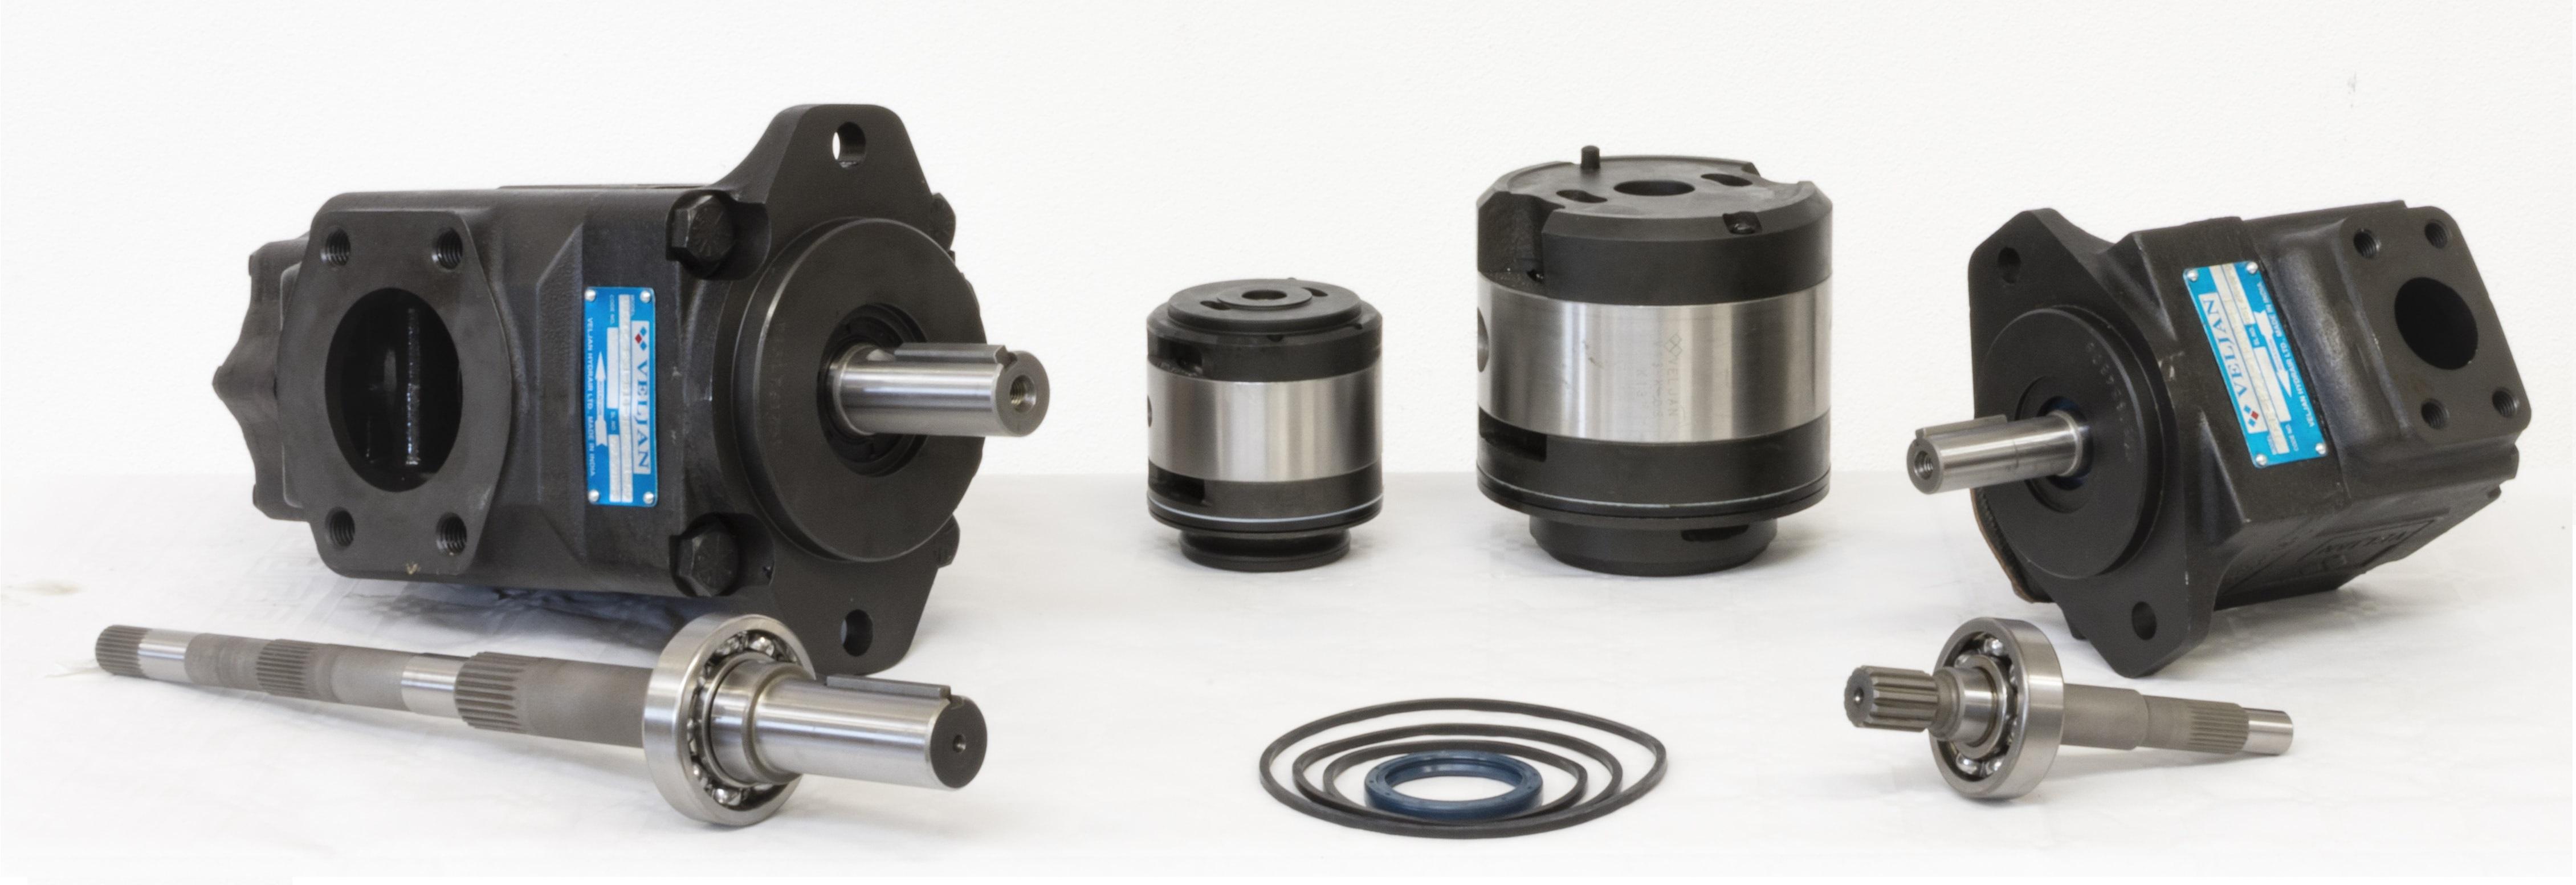 Veljan vane pumps compatible to denison quick delivery for Denison motors denison tx